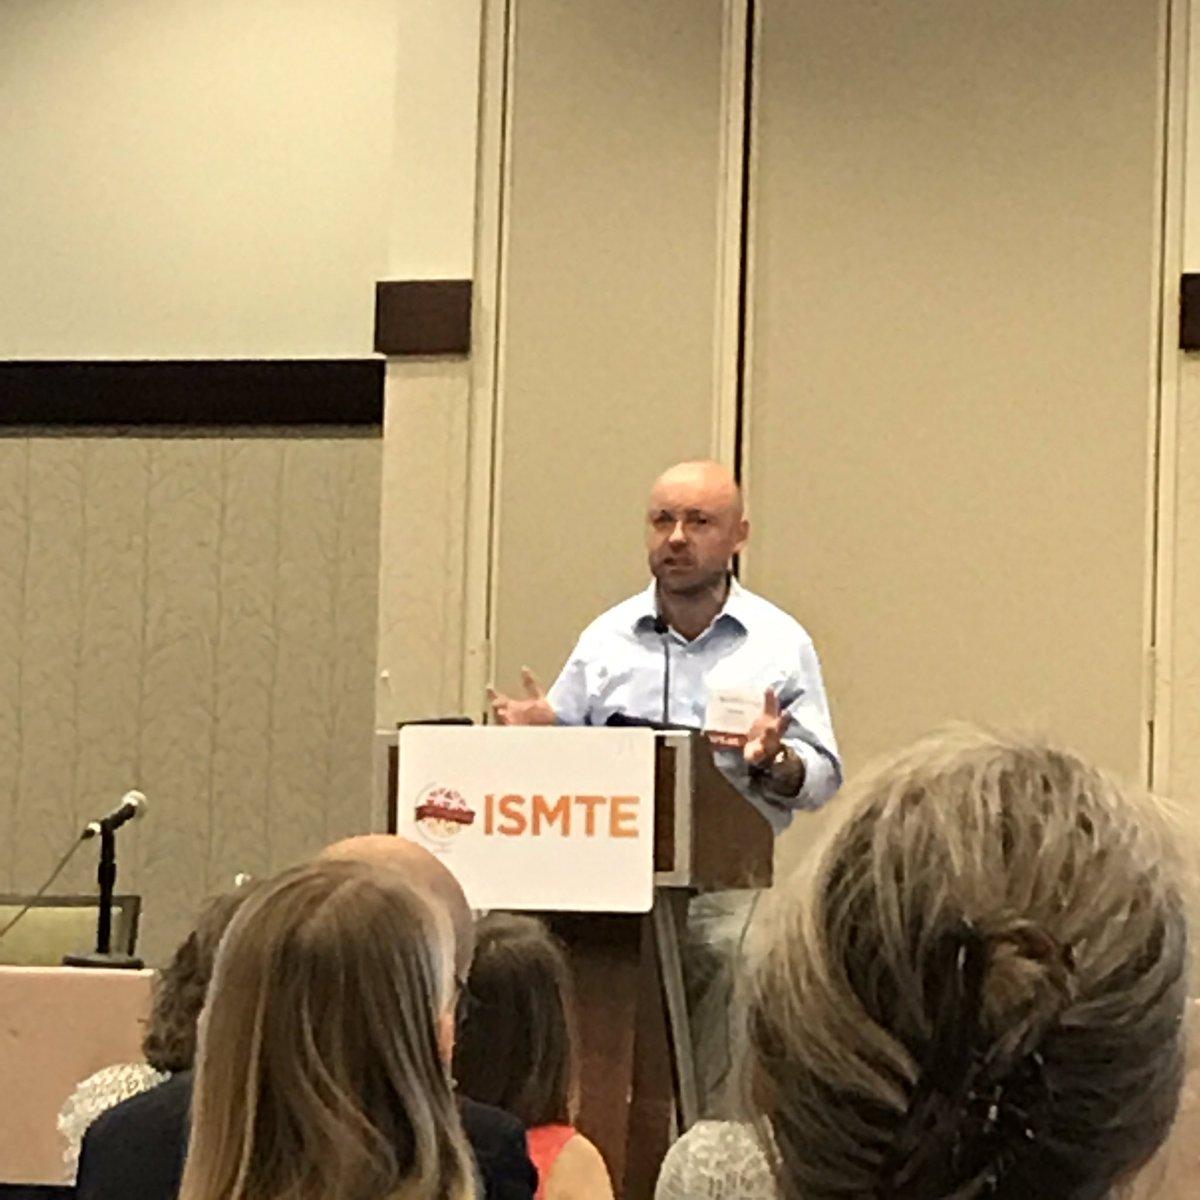 Keynote speaker Trevor Butterworth talks about quantitative literacy and understanding science  #ISMTE2017 #ISMTEis10 <br>http://pic.twitter.com/hEIjV4uZbV